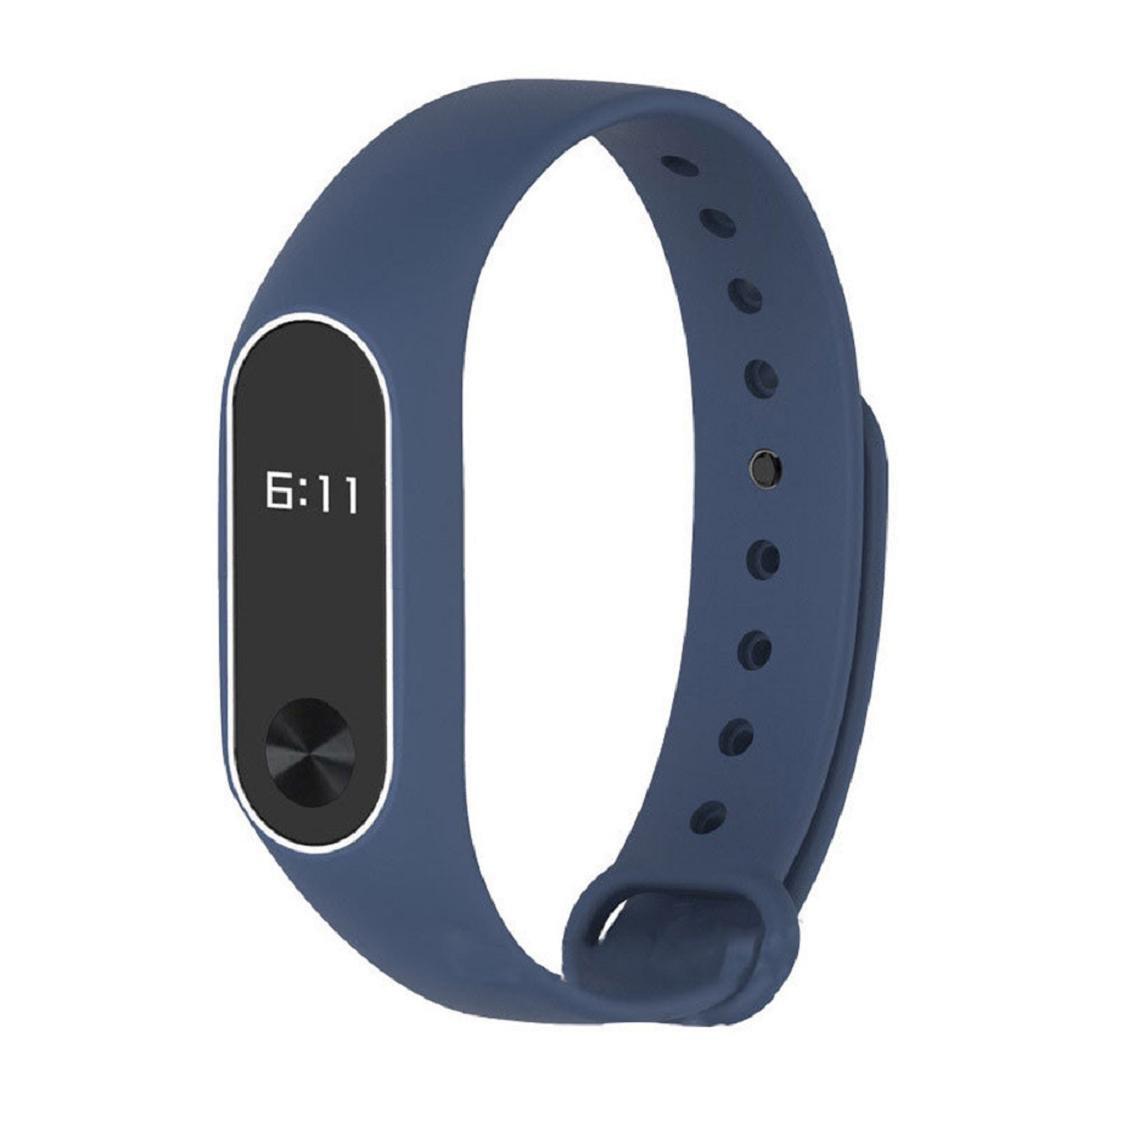 For Xiaomi Mi Band 2, Mchoice New Fashion Original Silicon Wrist Strap WristBand Bracelet Replacement for Xiaomi Mi Band 2 (Blue)